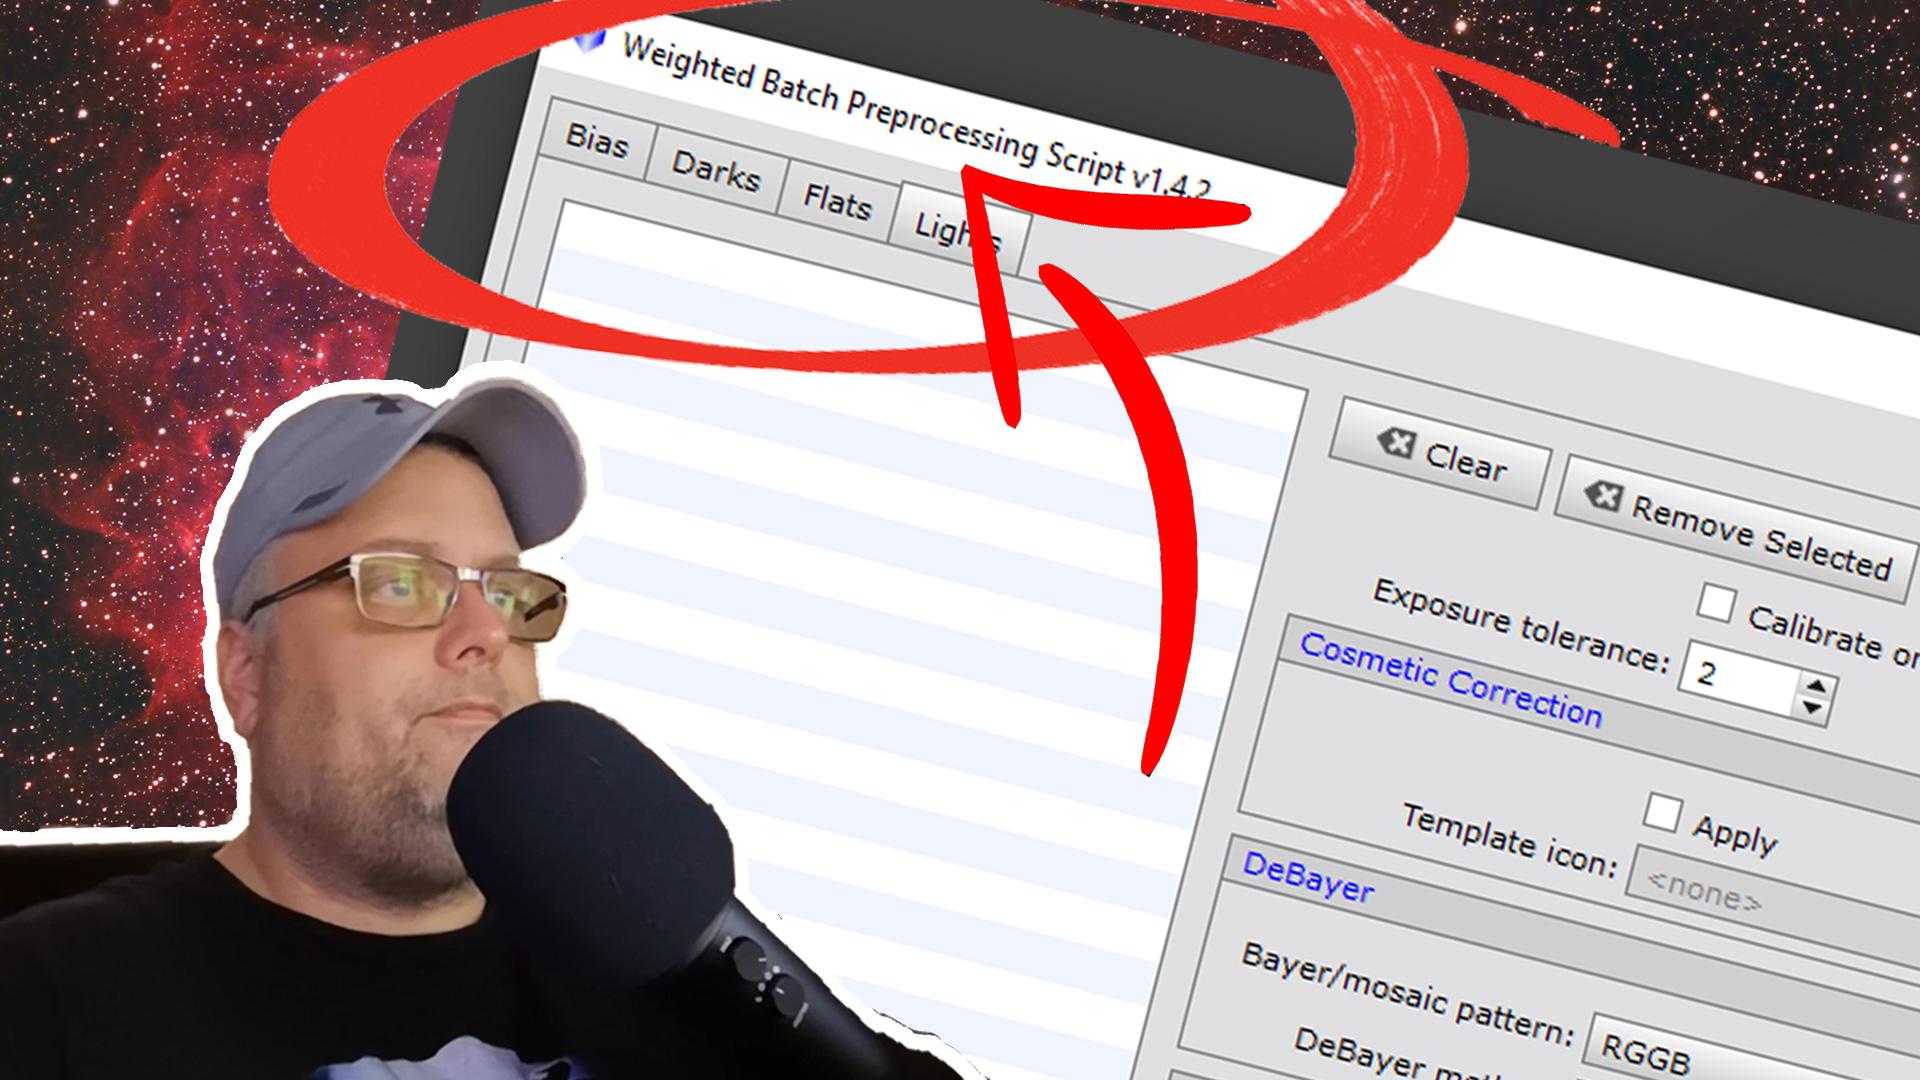 pixinsight weighted batch preprocessing script